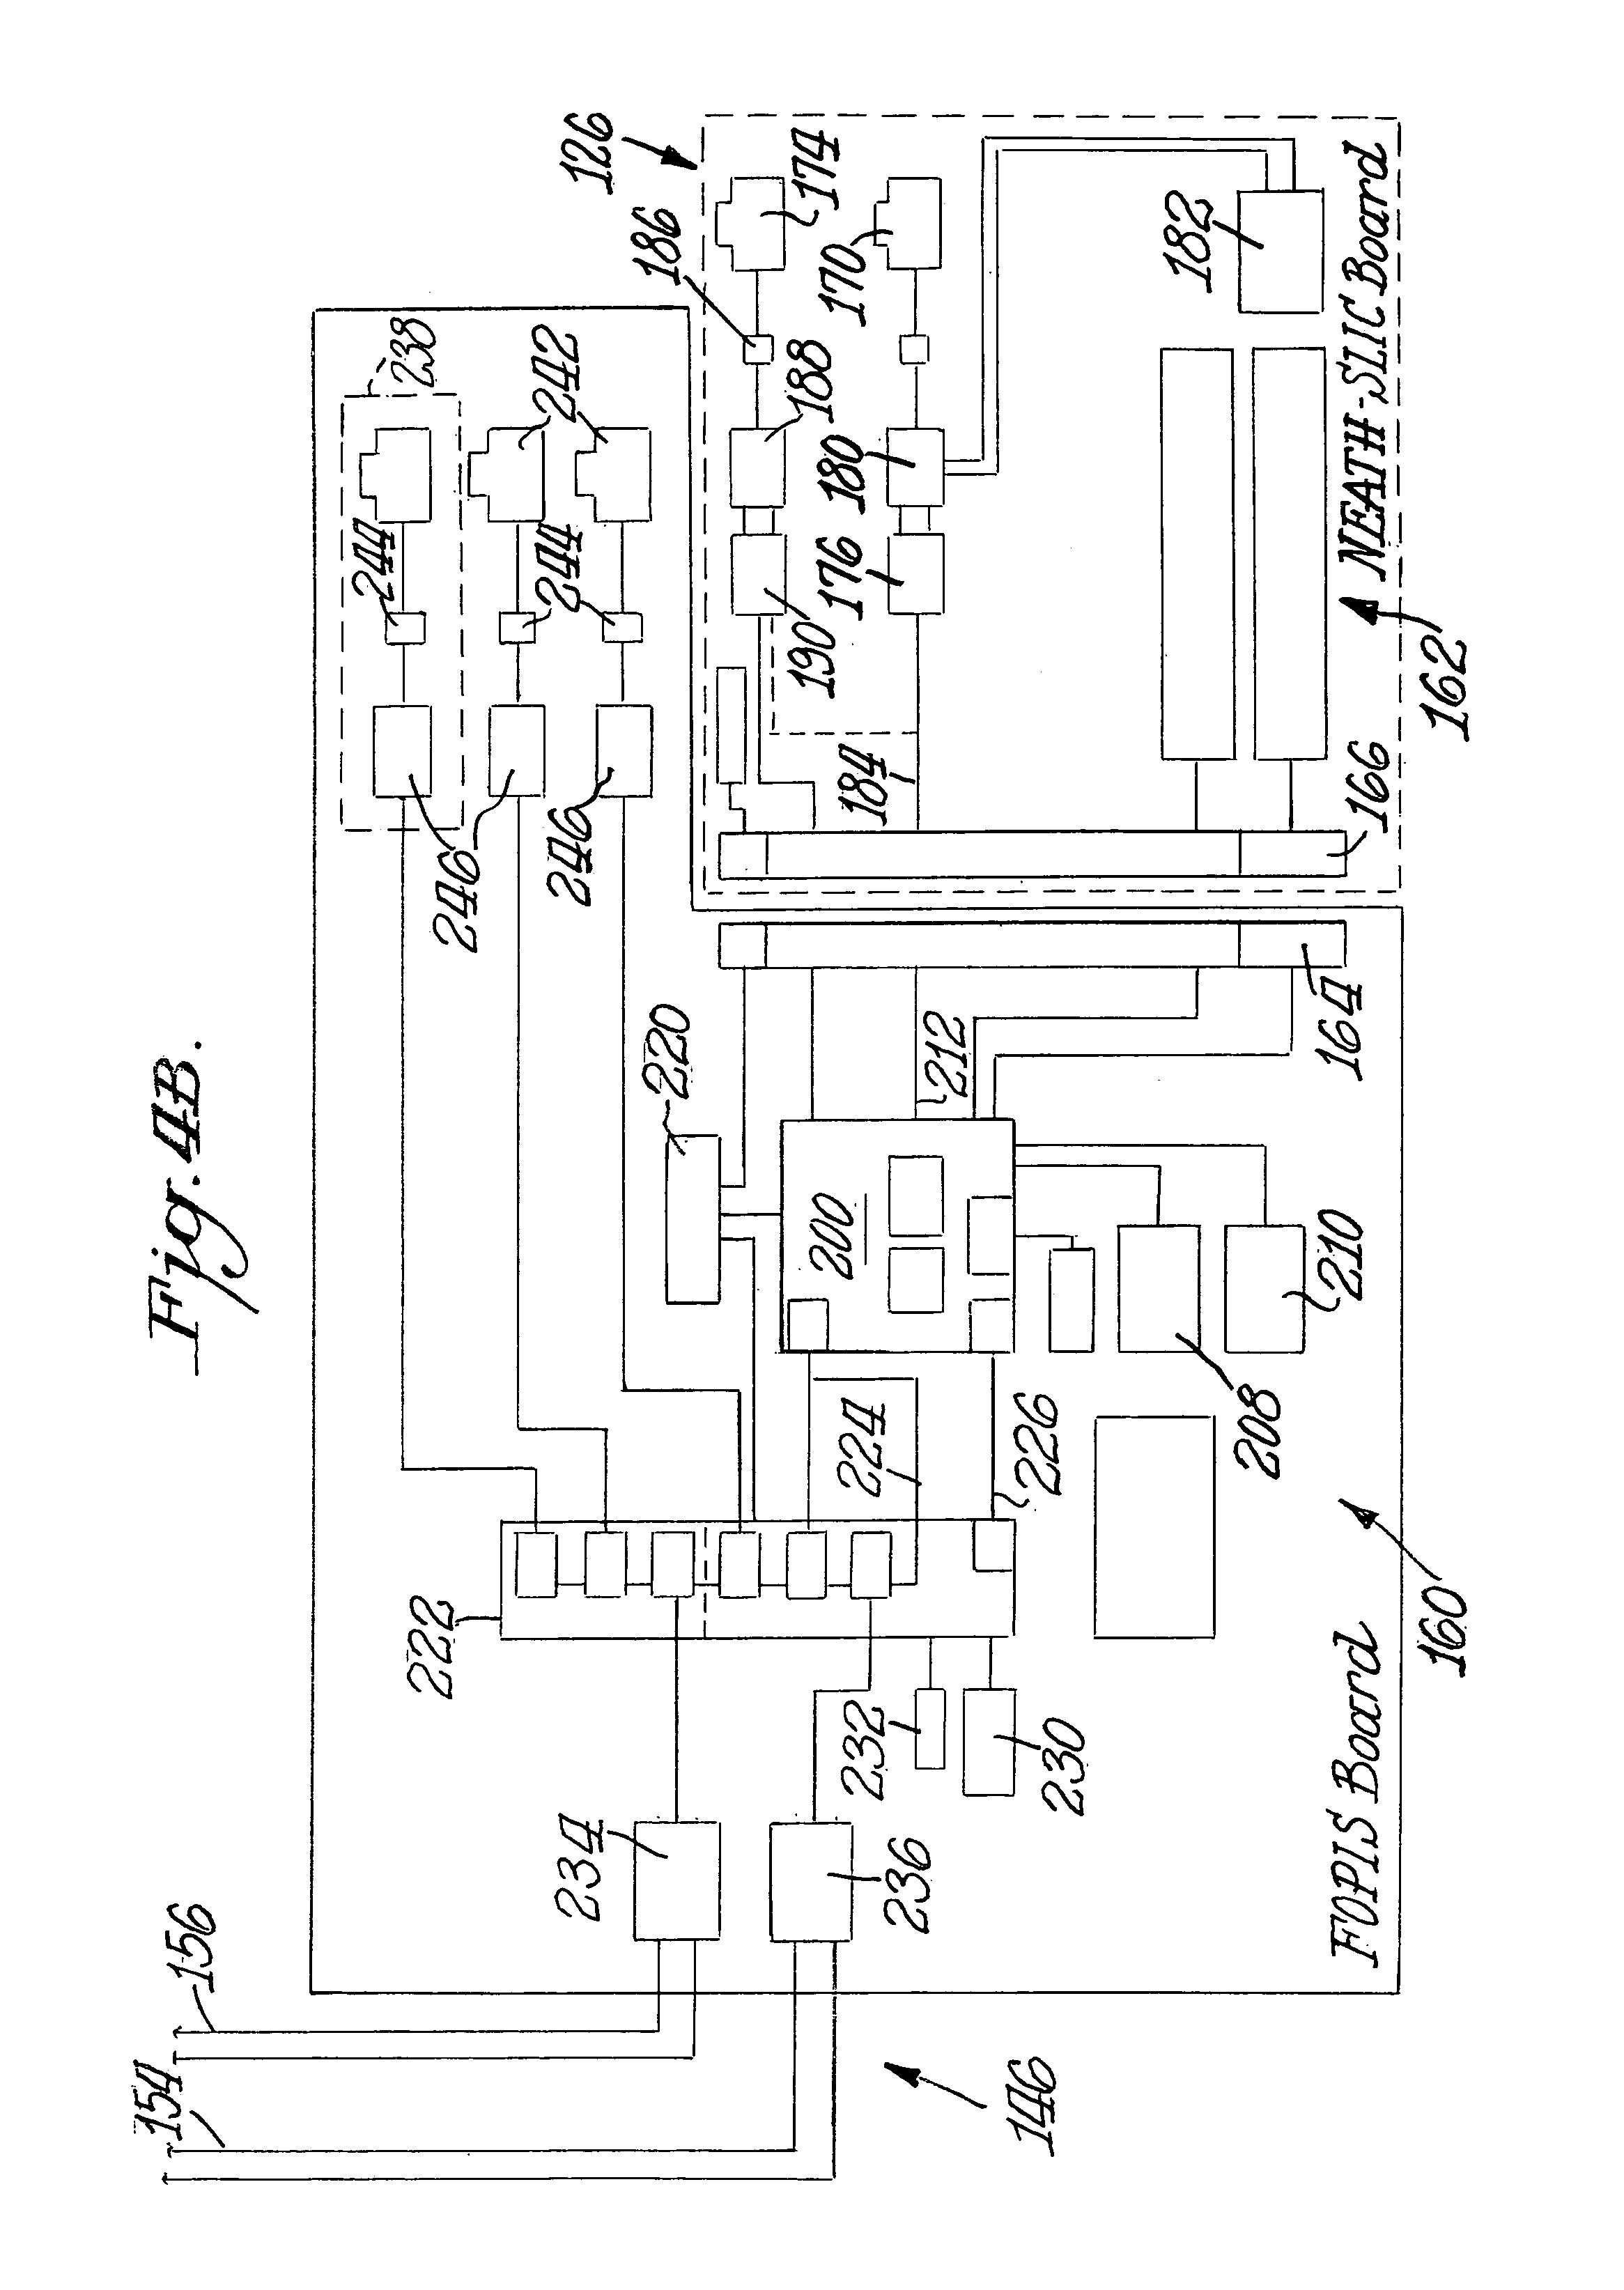 patent us7206392 - fiber optic premise wiring system